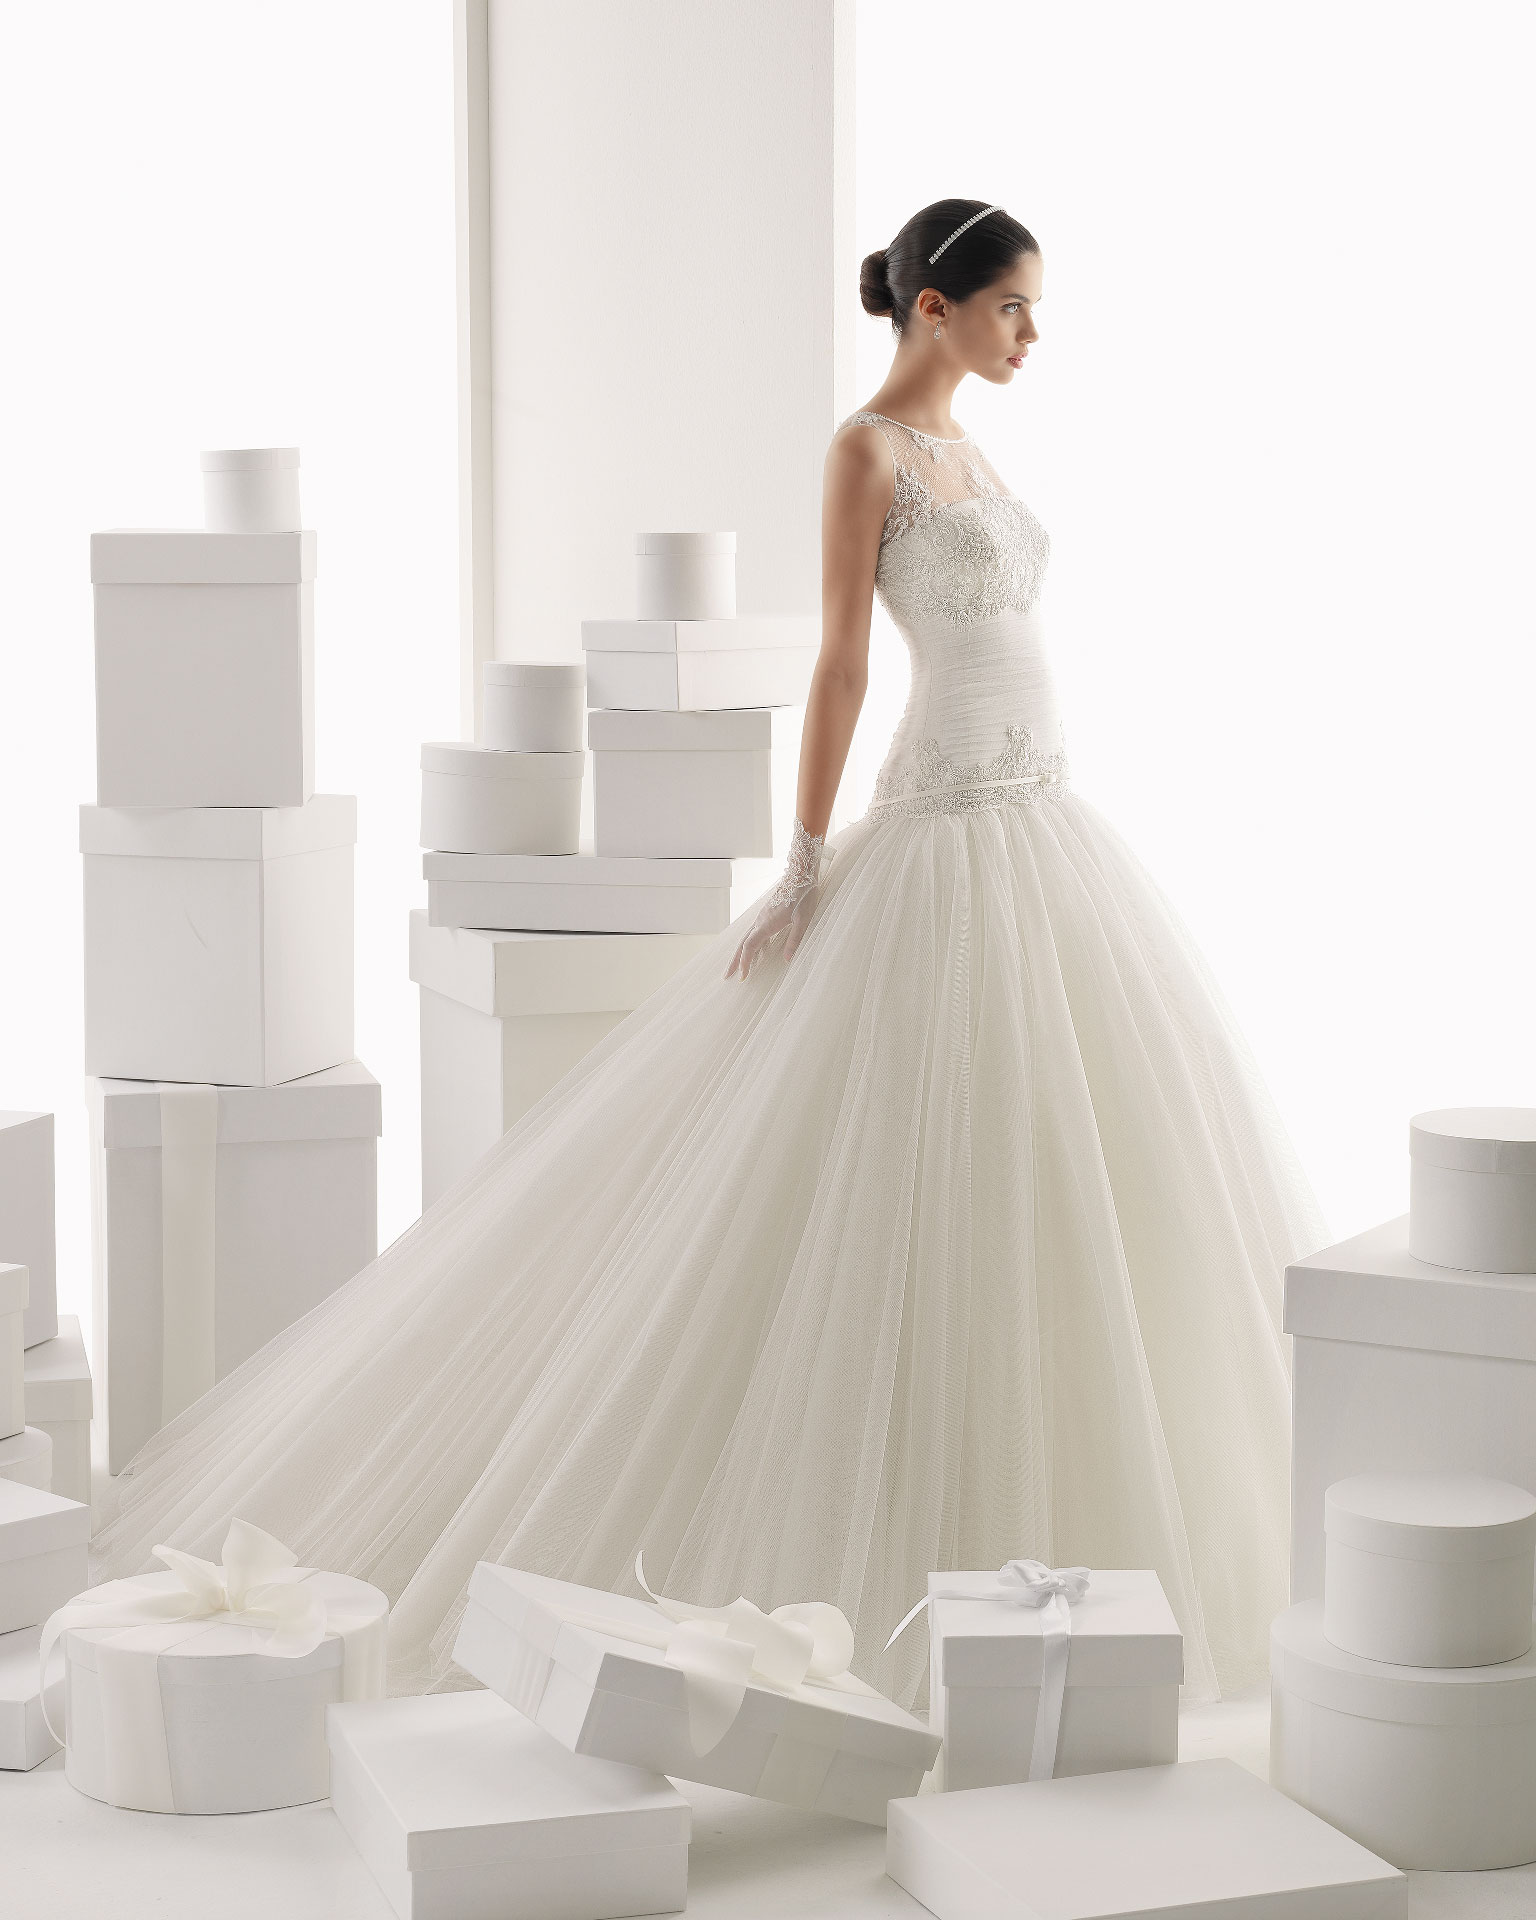 Rosa clara wedding dress 2014 bridal camila for Rosa clara wedding dresses 2014